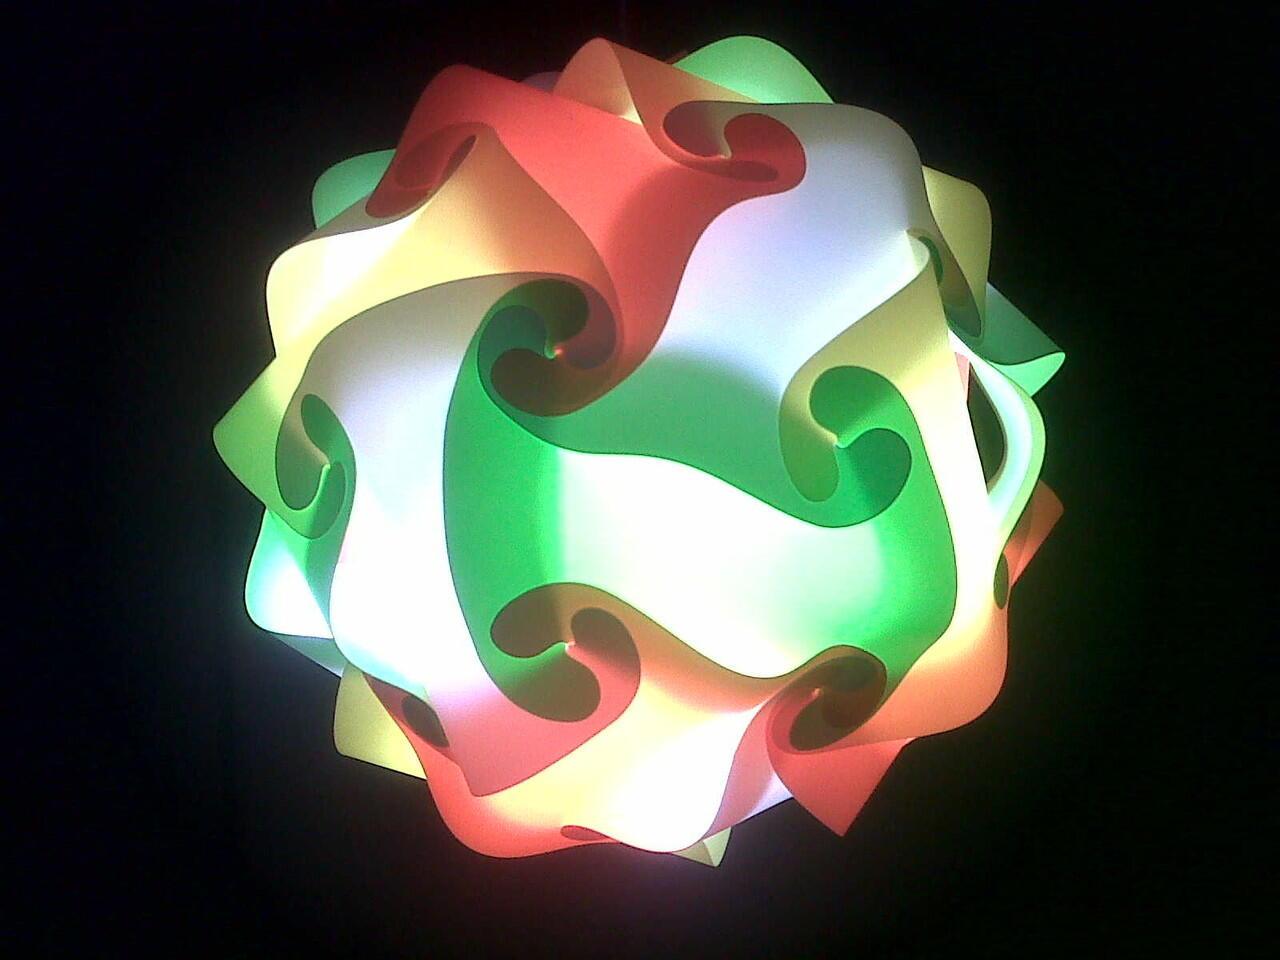 Lampu Hias dari Bahan Fiber